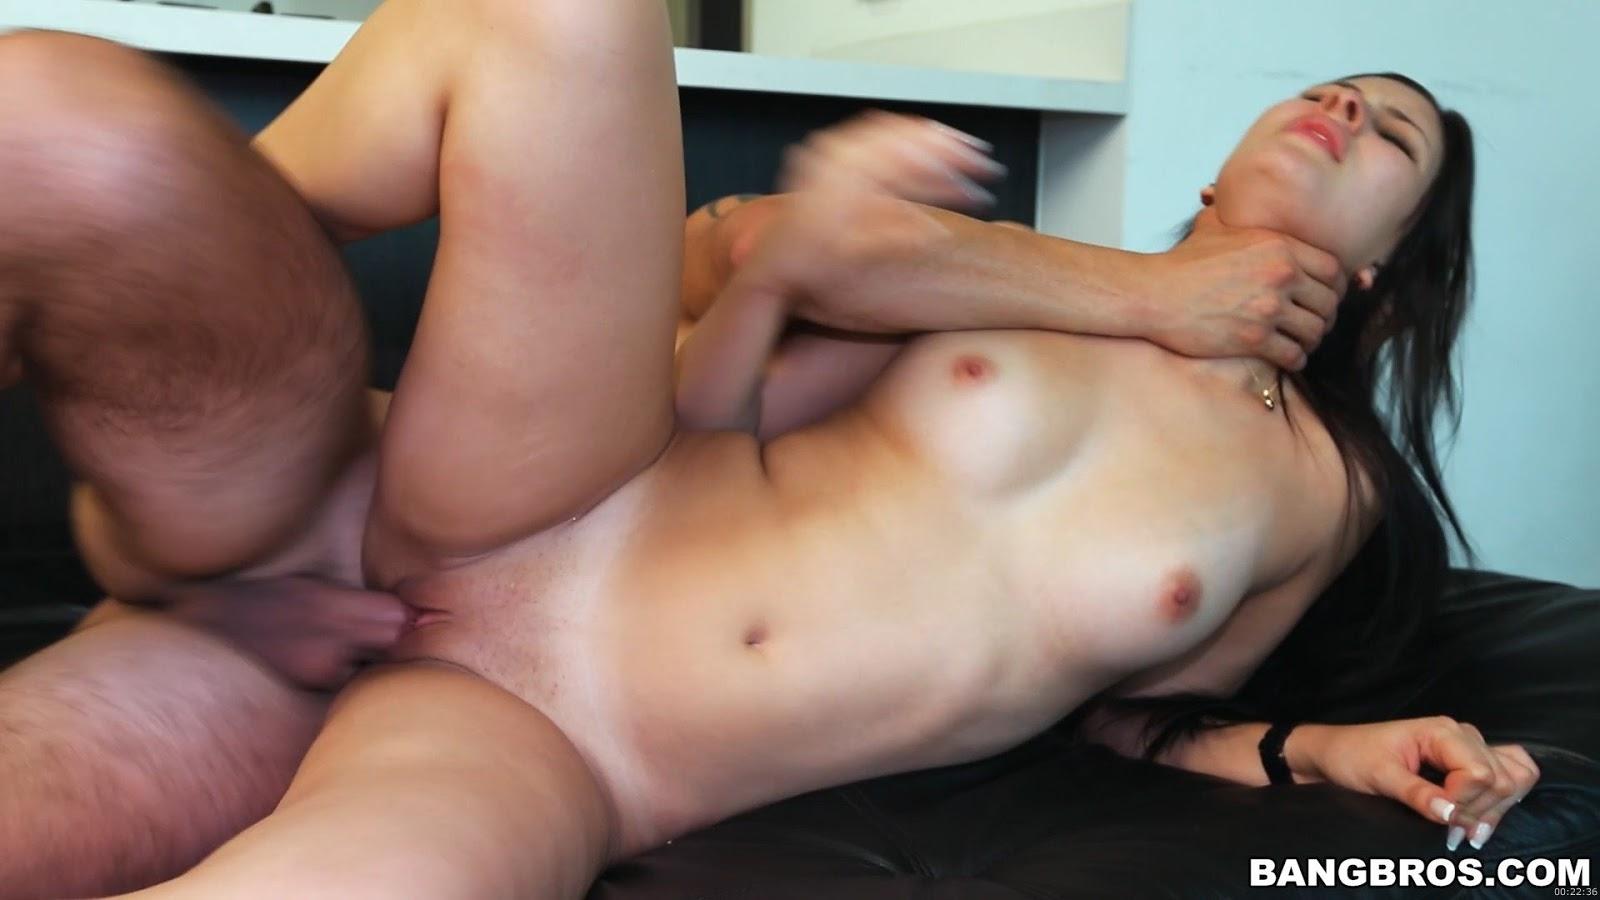 UNCENSORED [bangbros]2017-04-18 Twenty Year Old Colombian Babe Gets Properly Fucked, AV uncensored